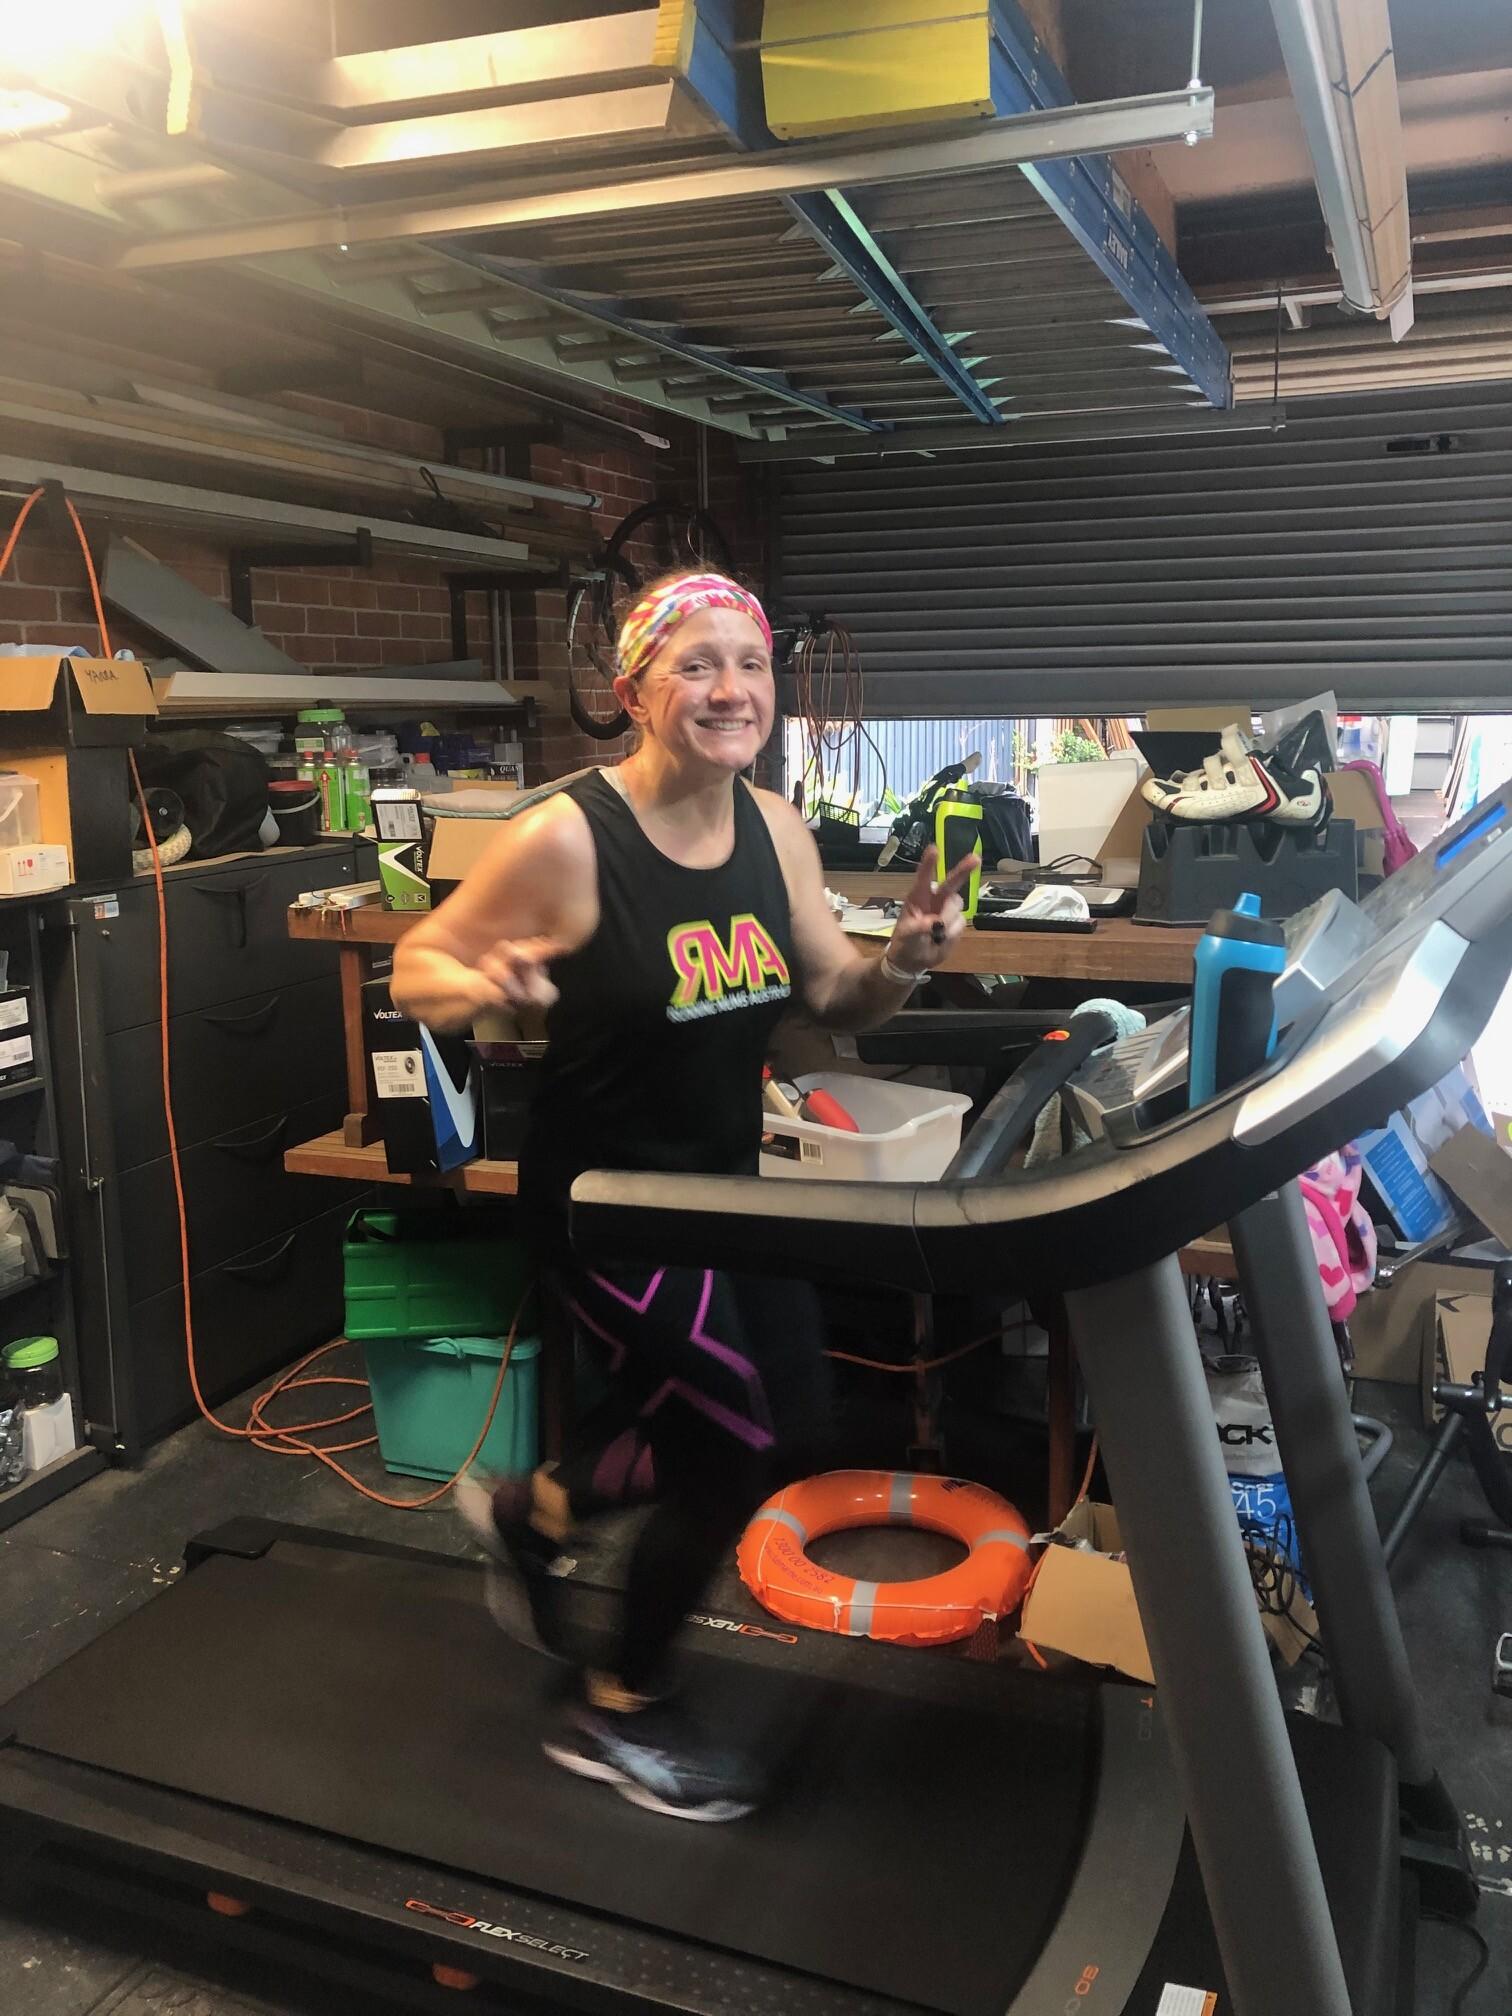 My COVID-19 Treadmill marathon by Kerry Downey